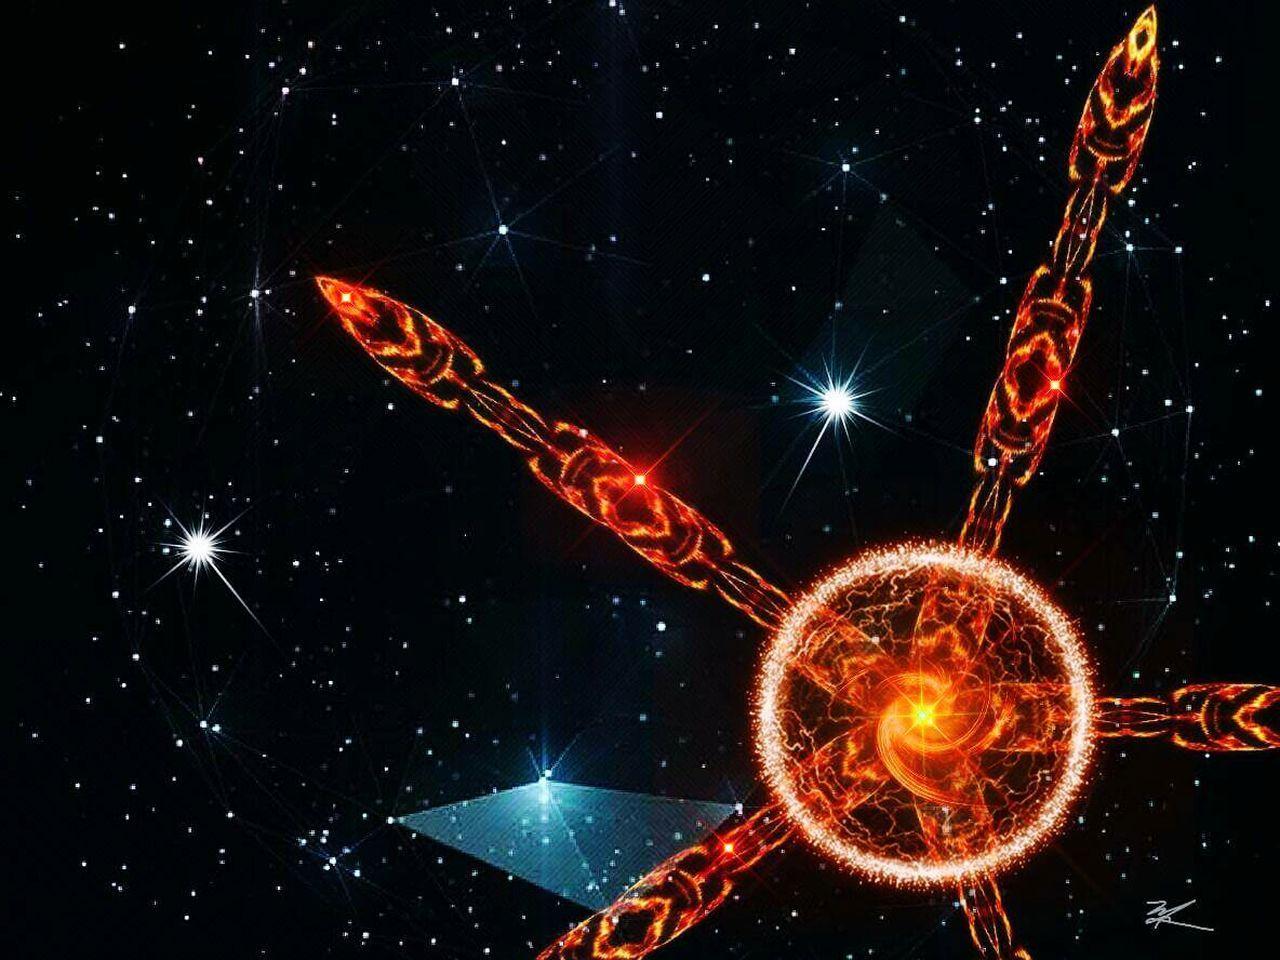 Star - Space Night Illuminated Space My Artwork Digital Art Abstract Art